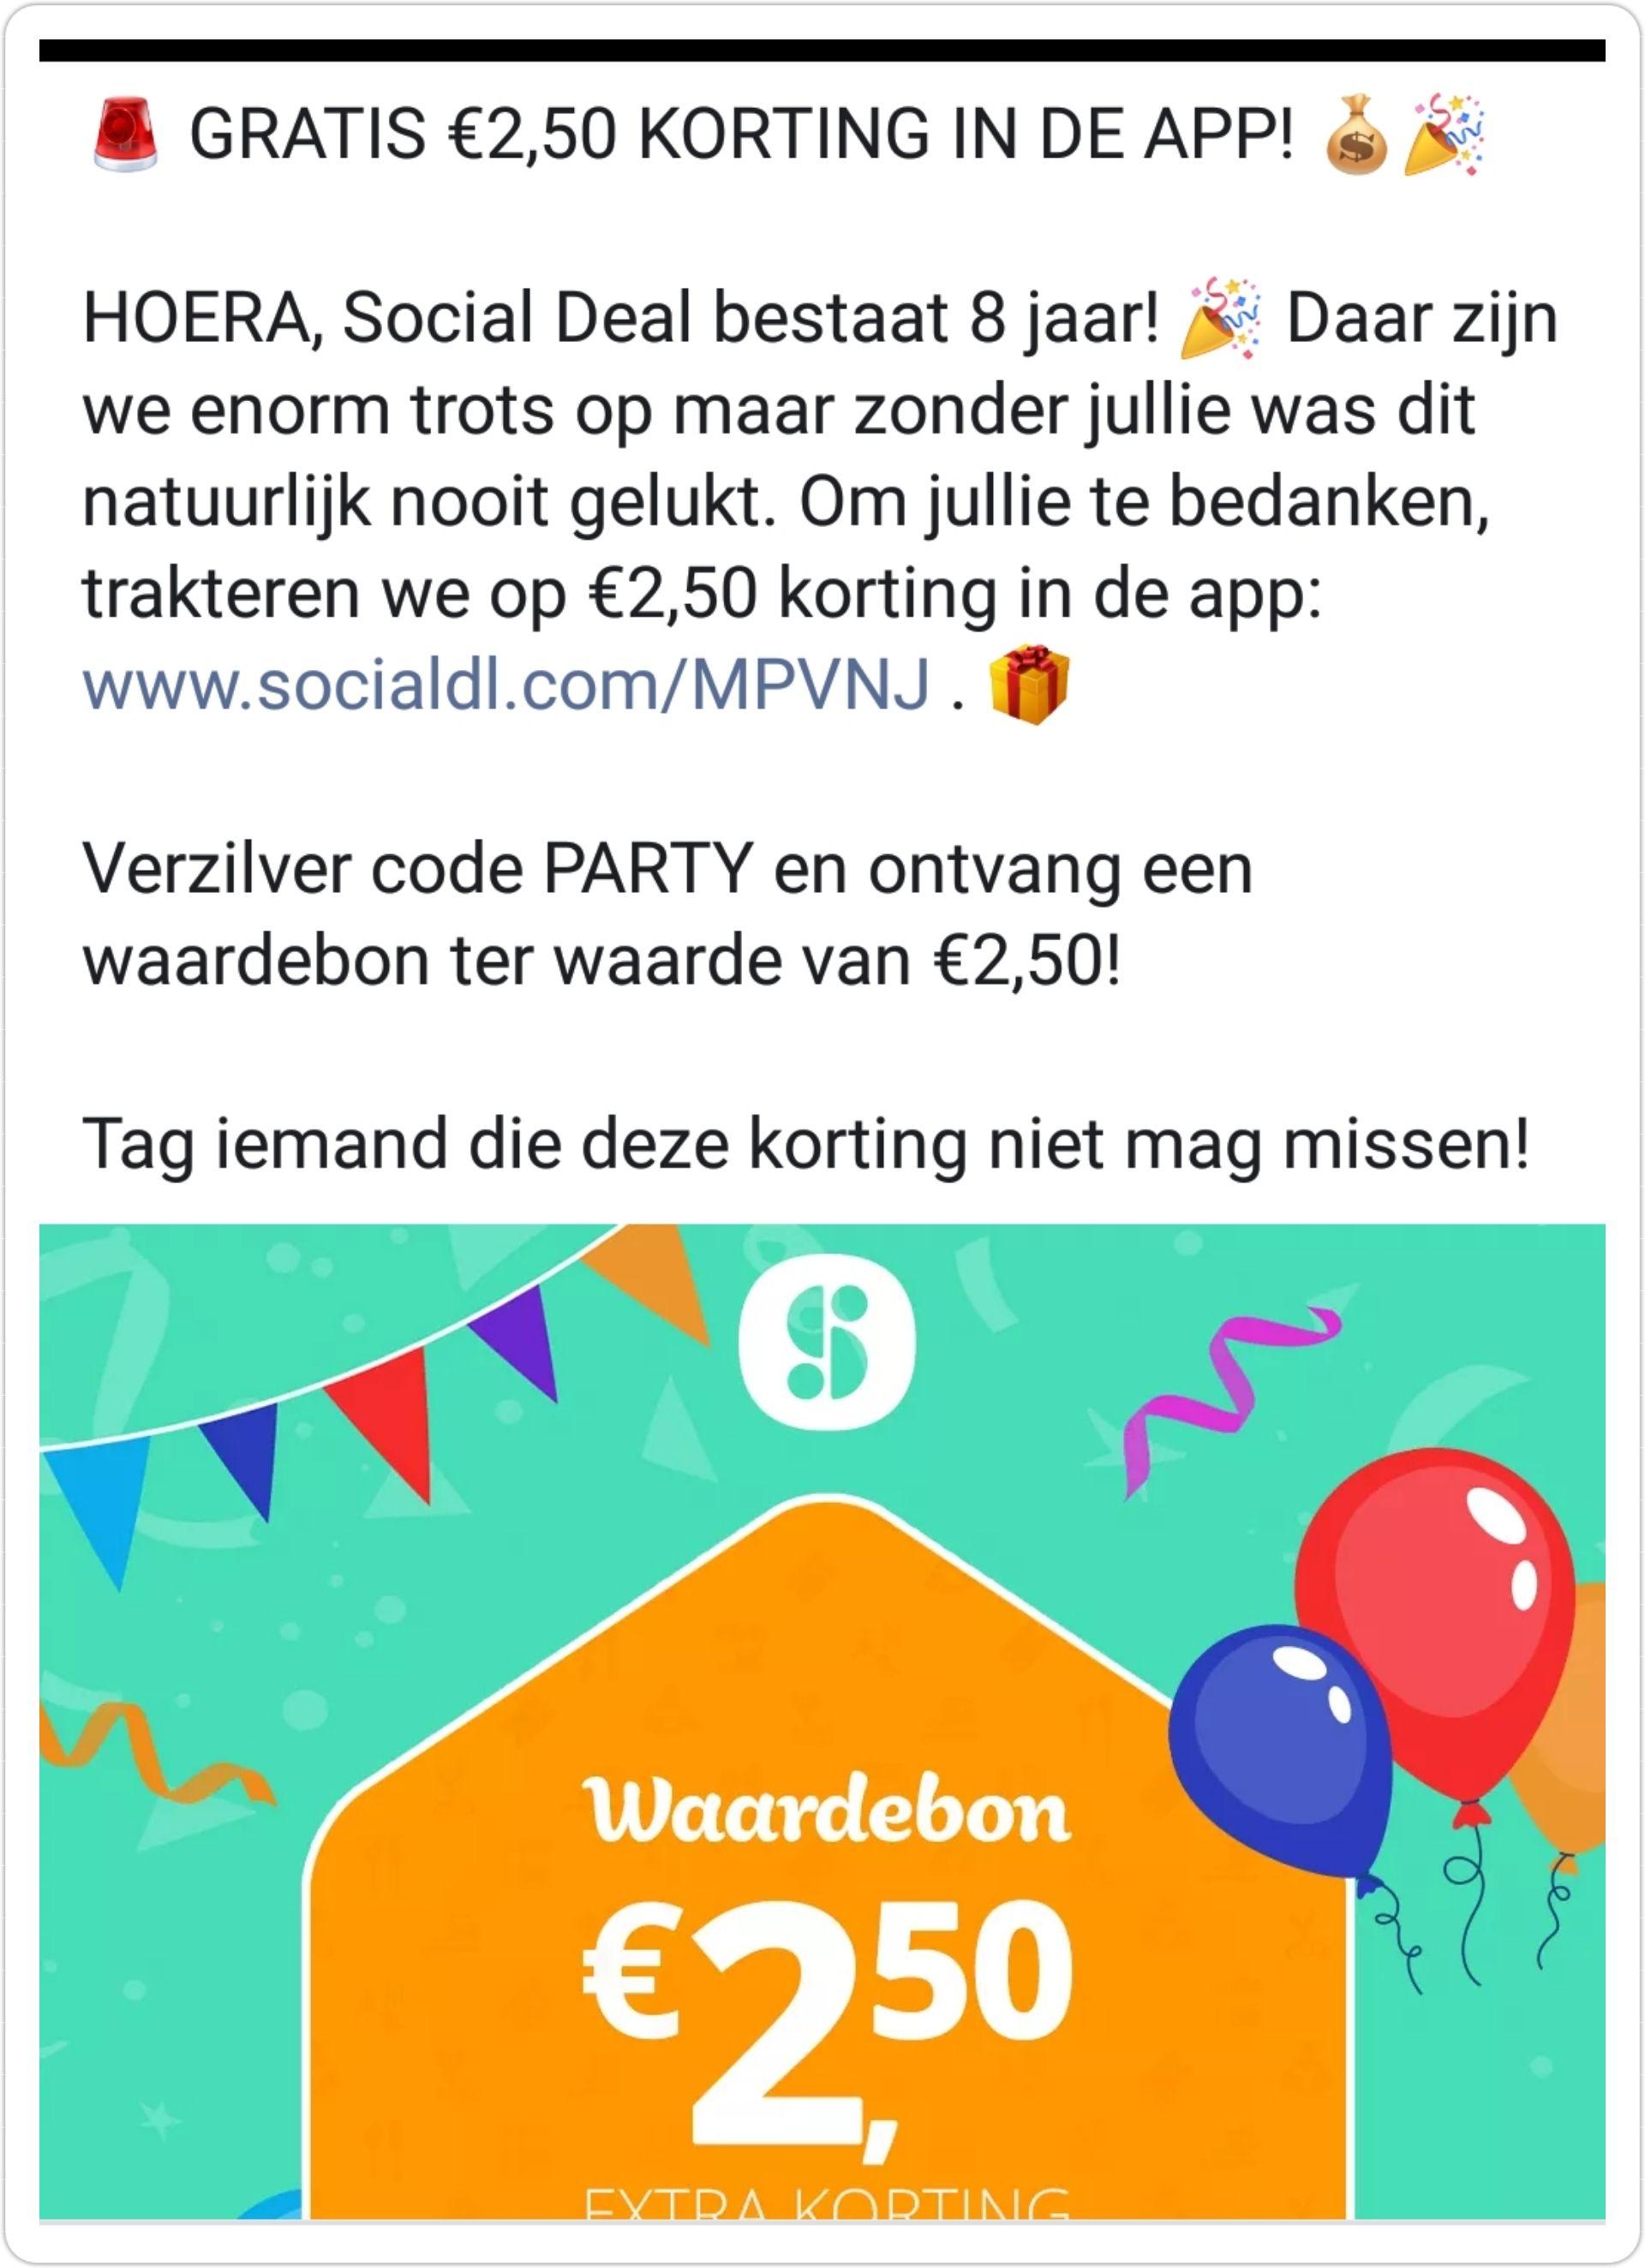 €2,50 Social Deal tegoed in de app